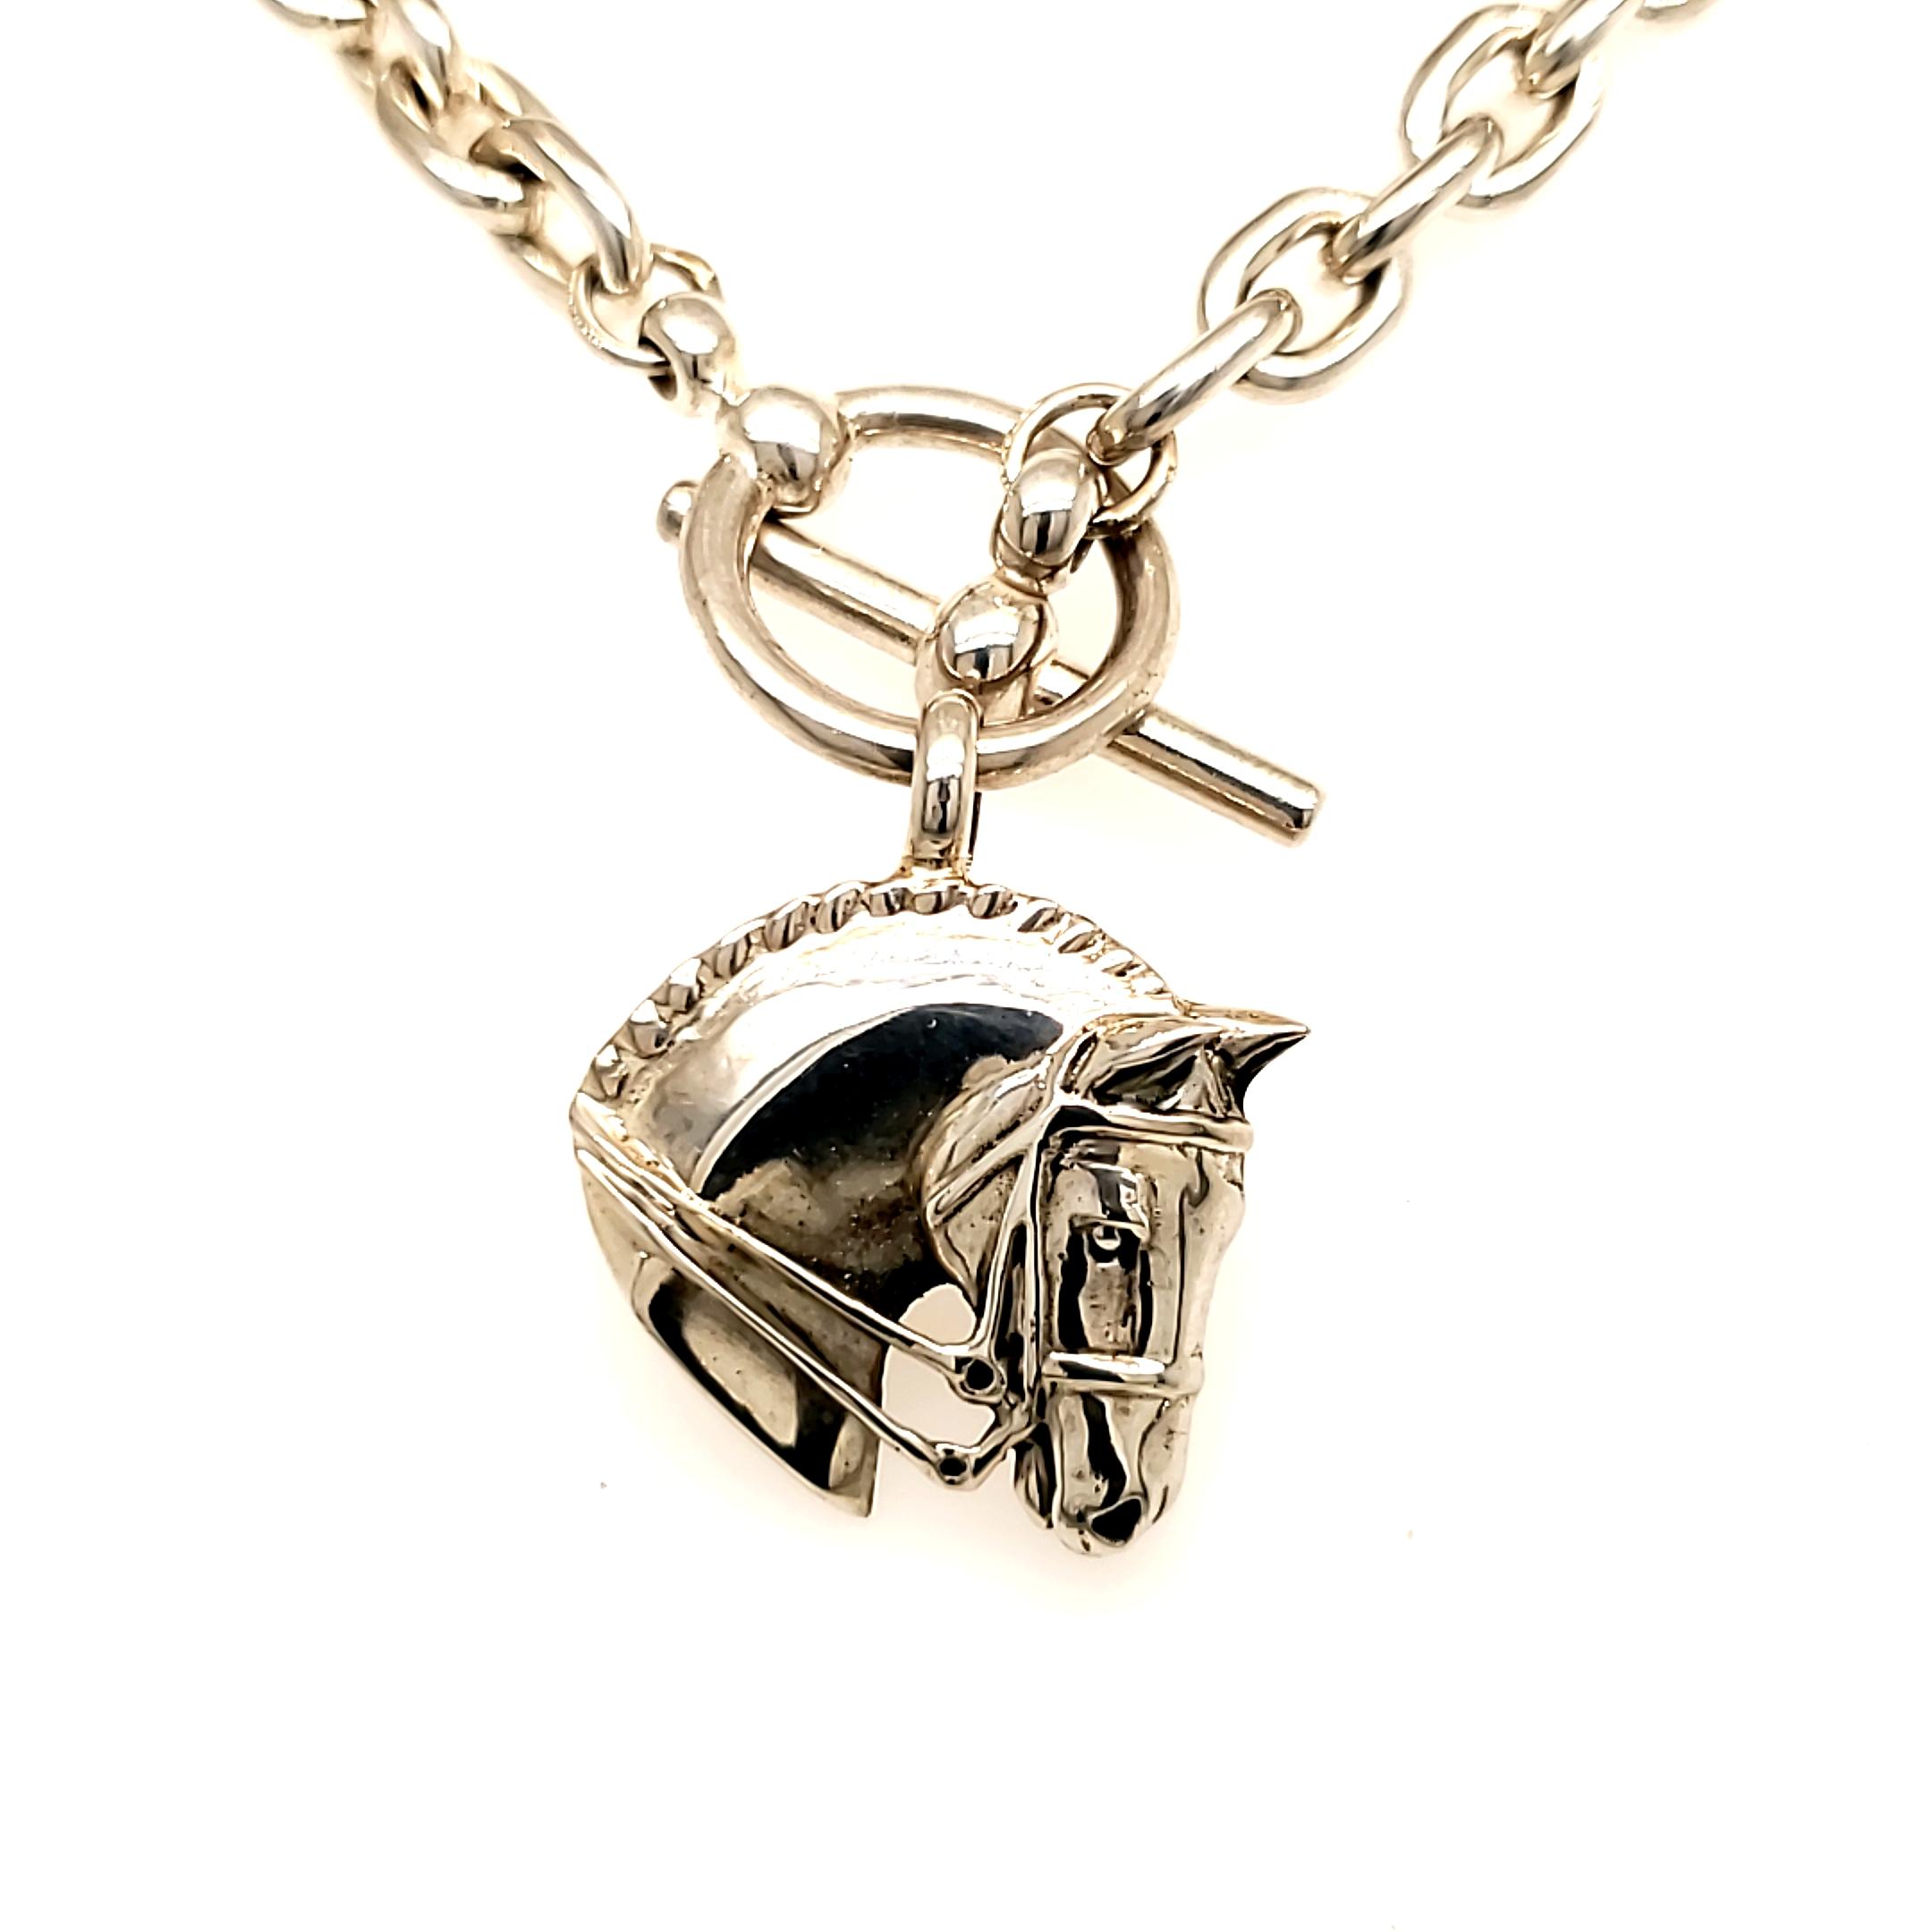 Jane Heart Dressage Horse Necklace